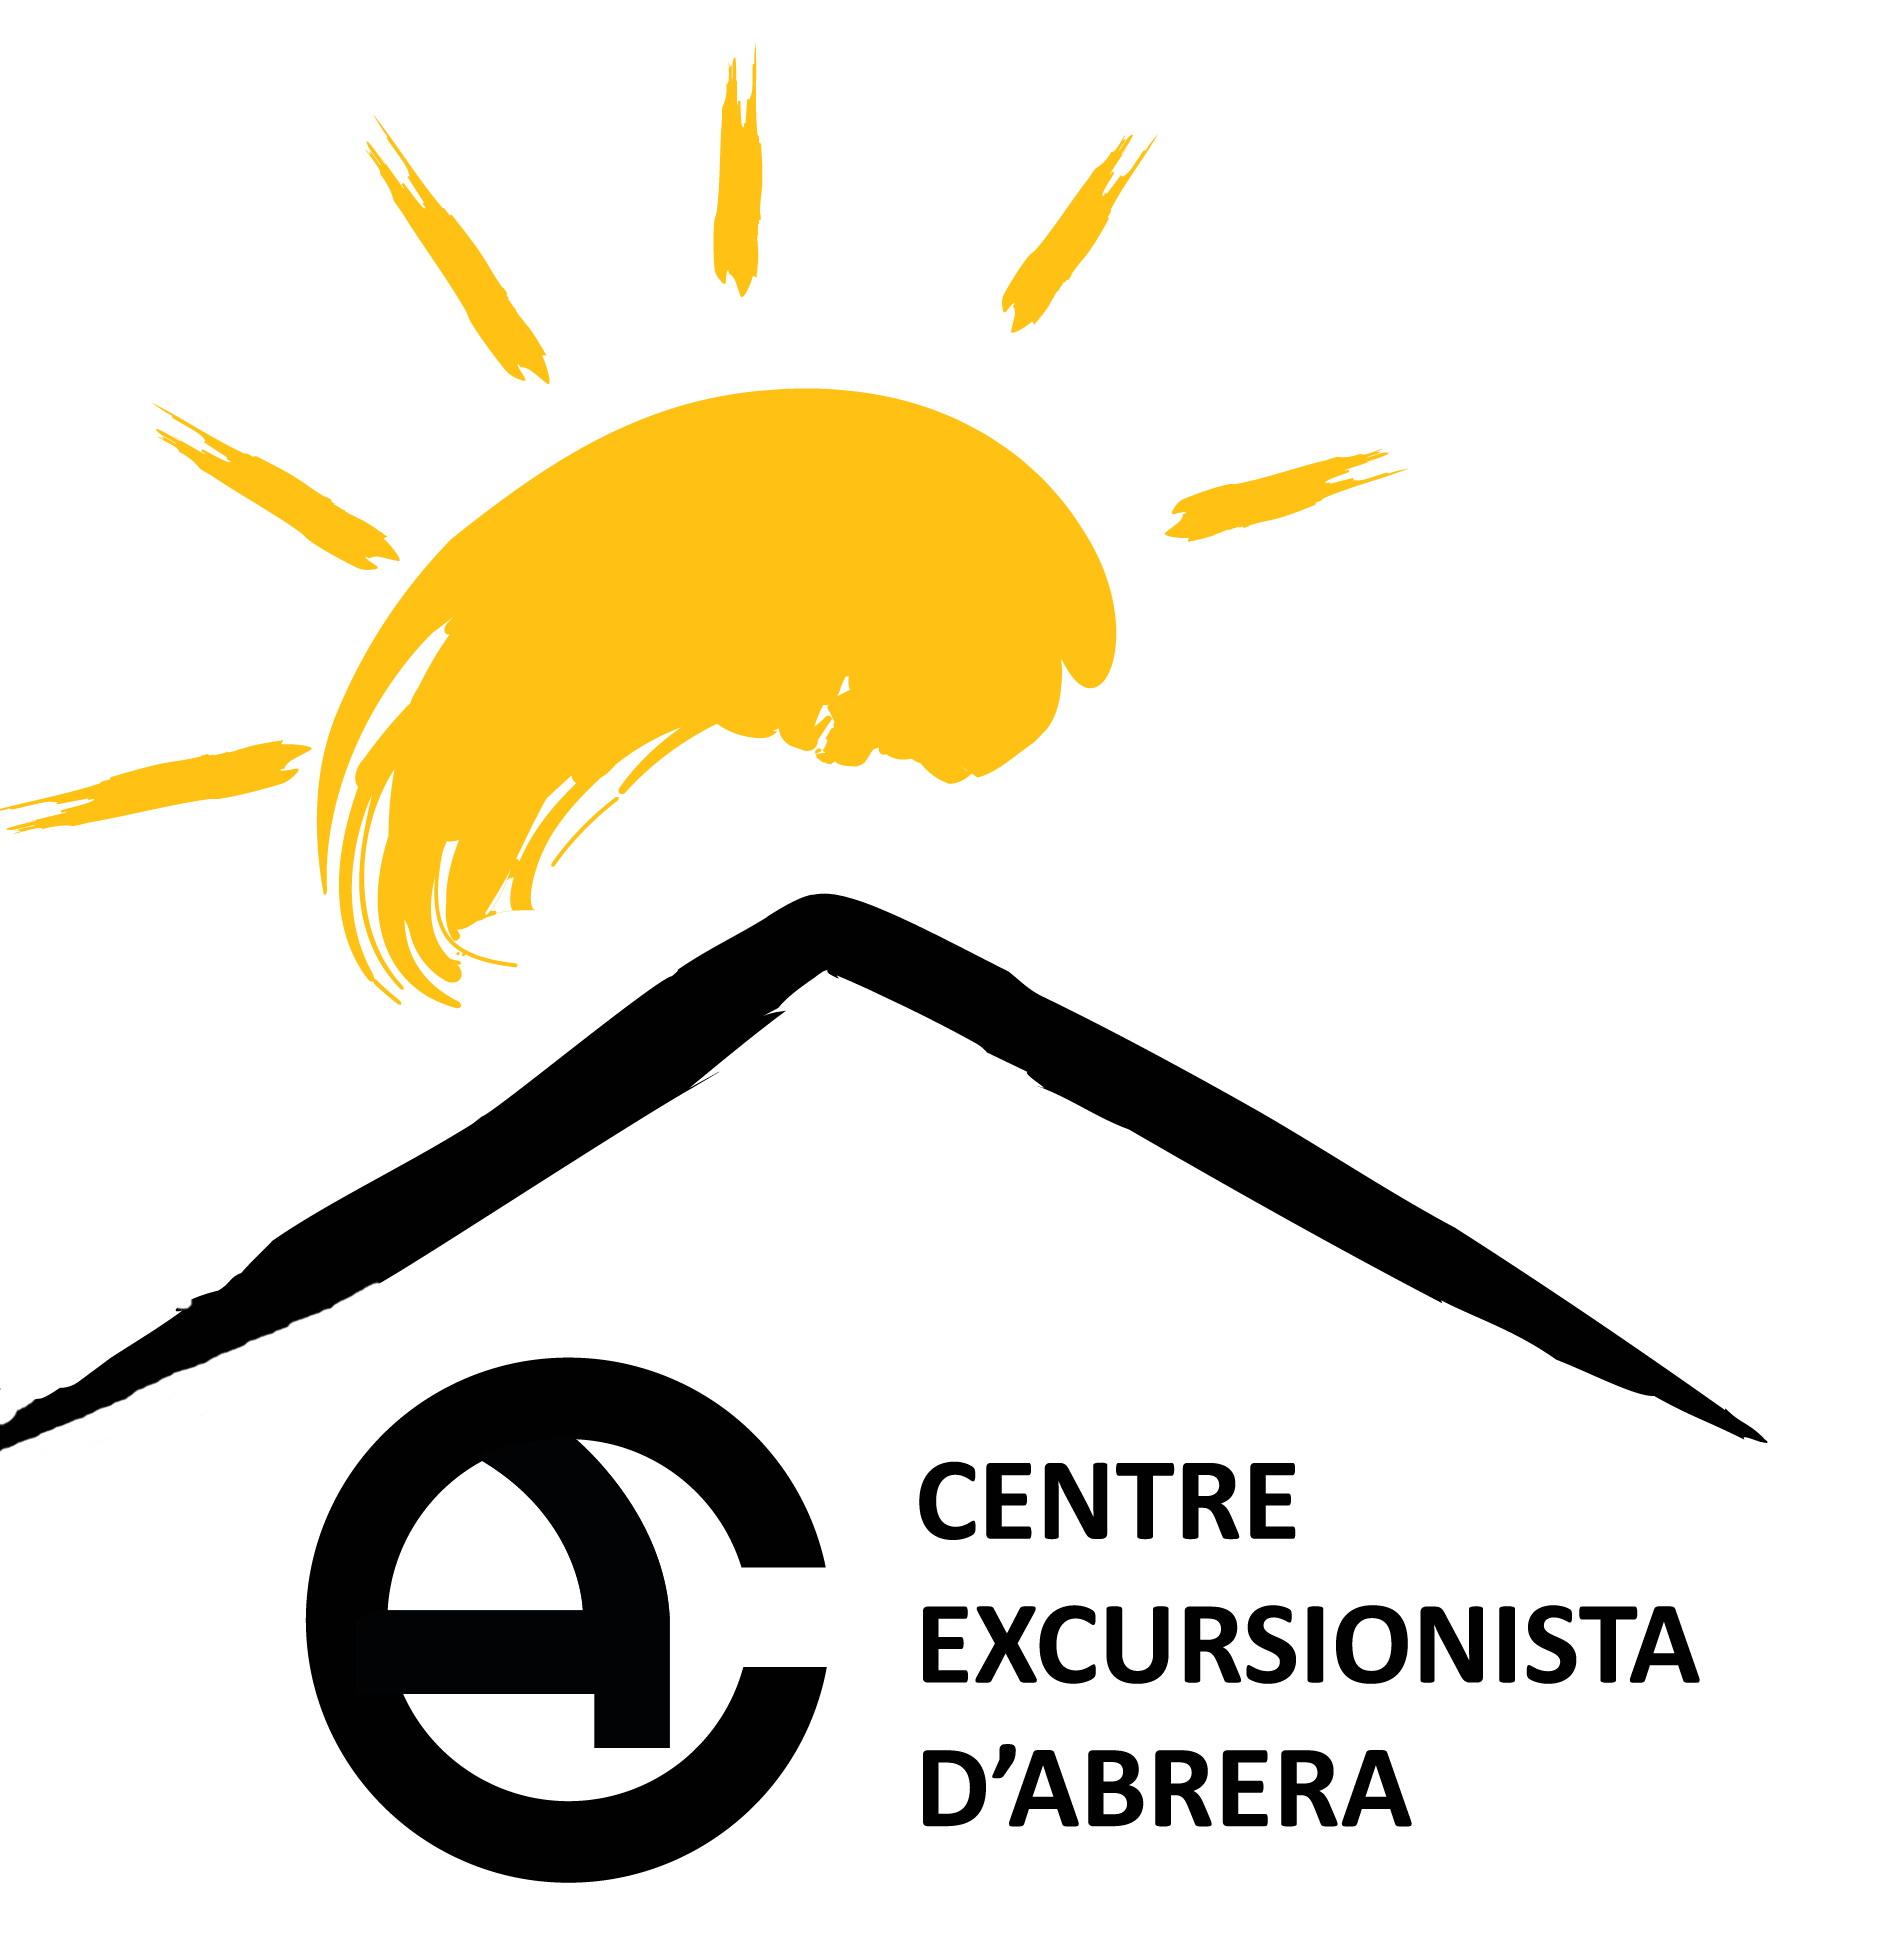 CENTRE EXC. D'ABRERA